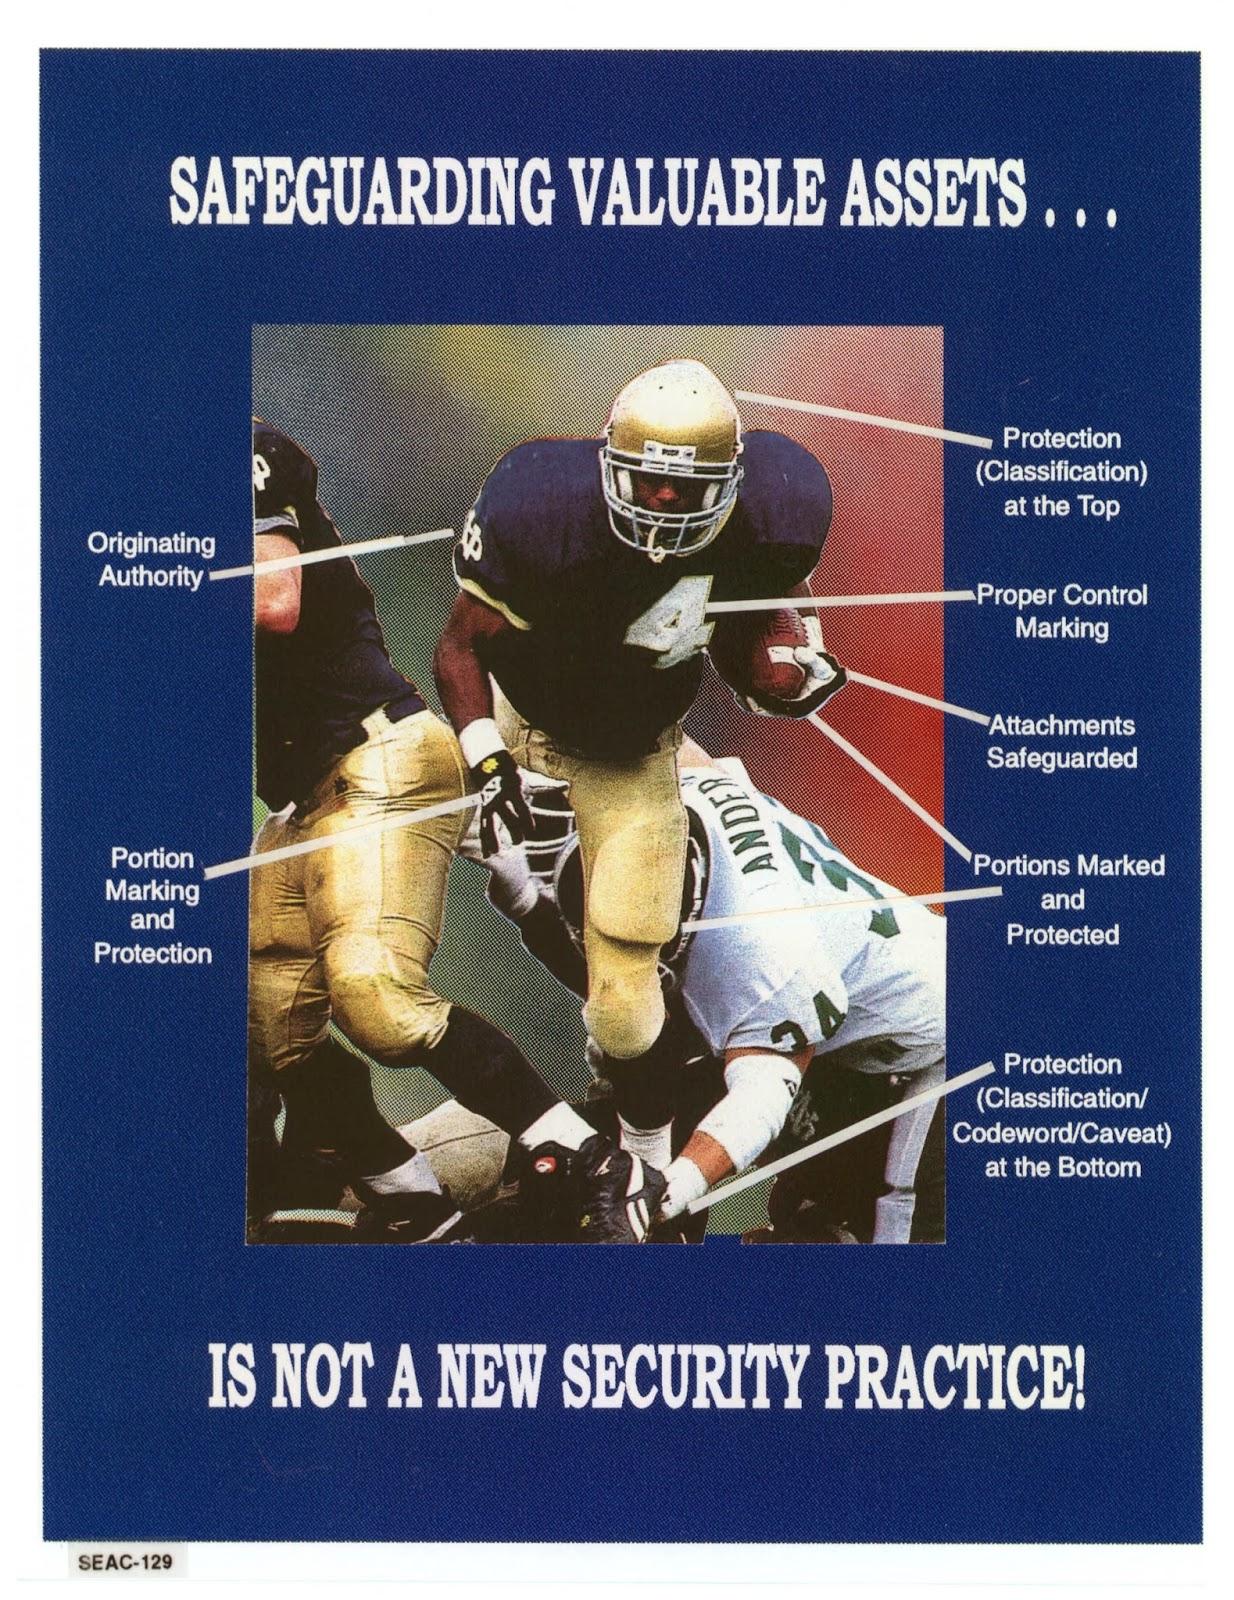 Safeguard valuable assets